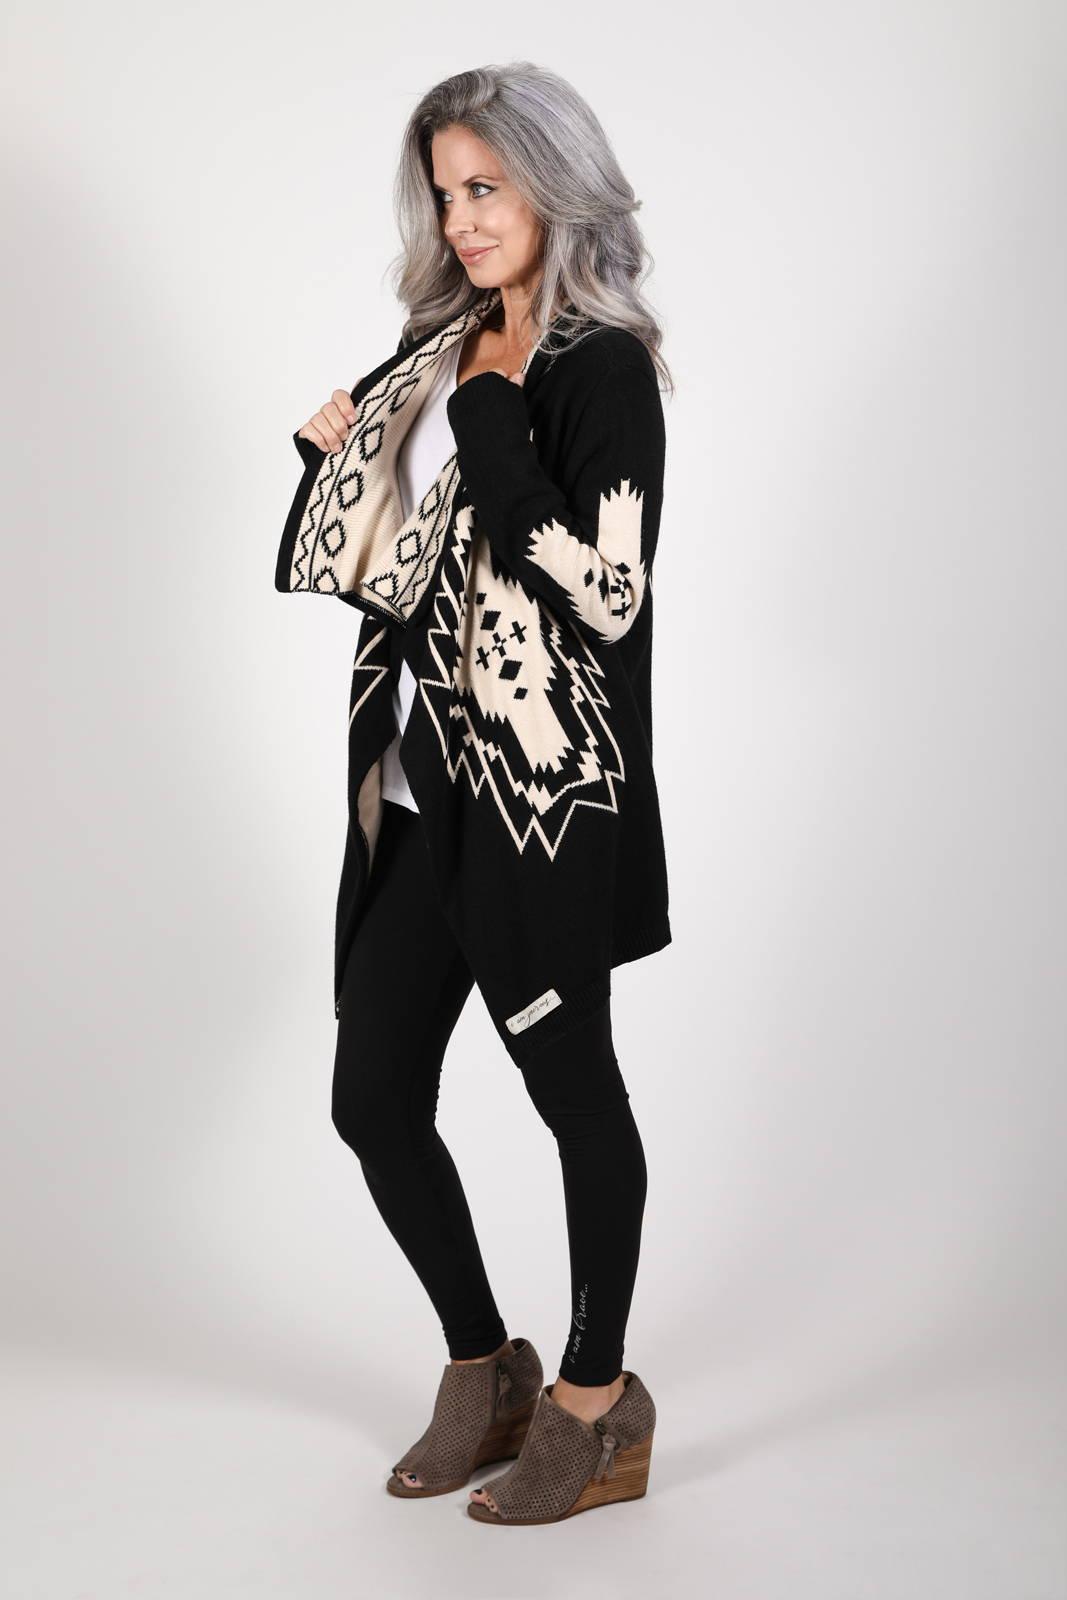 Model wearing the Nani Cardigan and Lumo Leggings, by illuminative